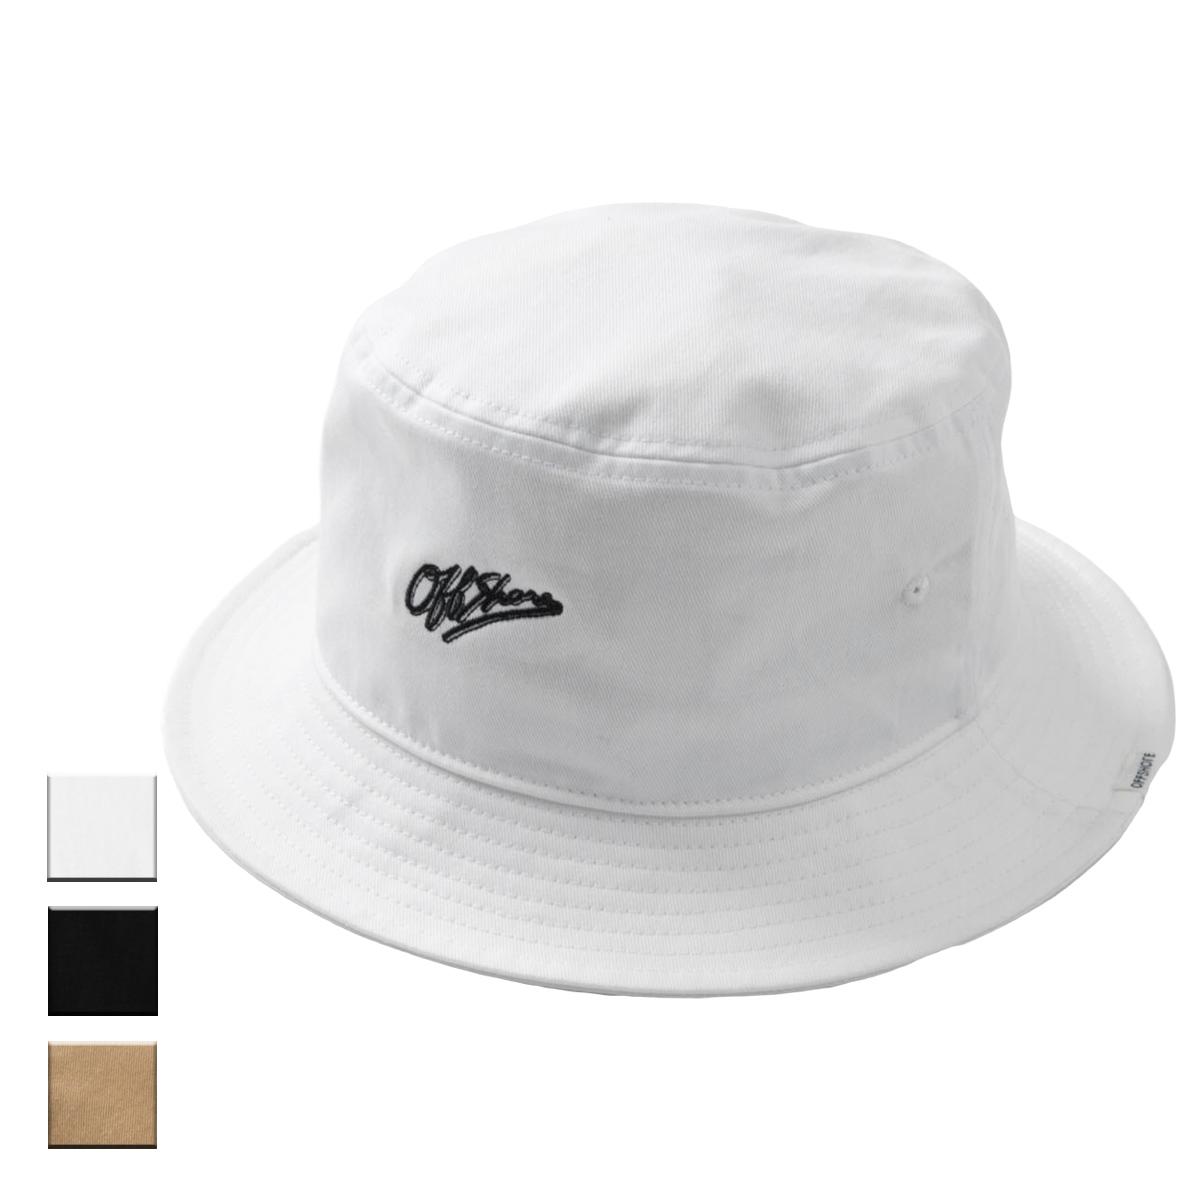 OFFSHORE オフショア AECHIVE LOGO BUCKET HAT